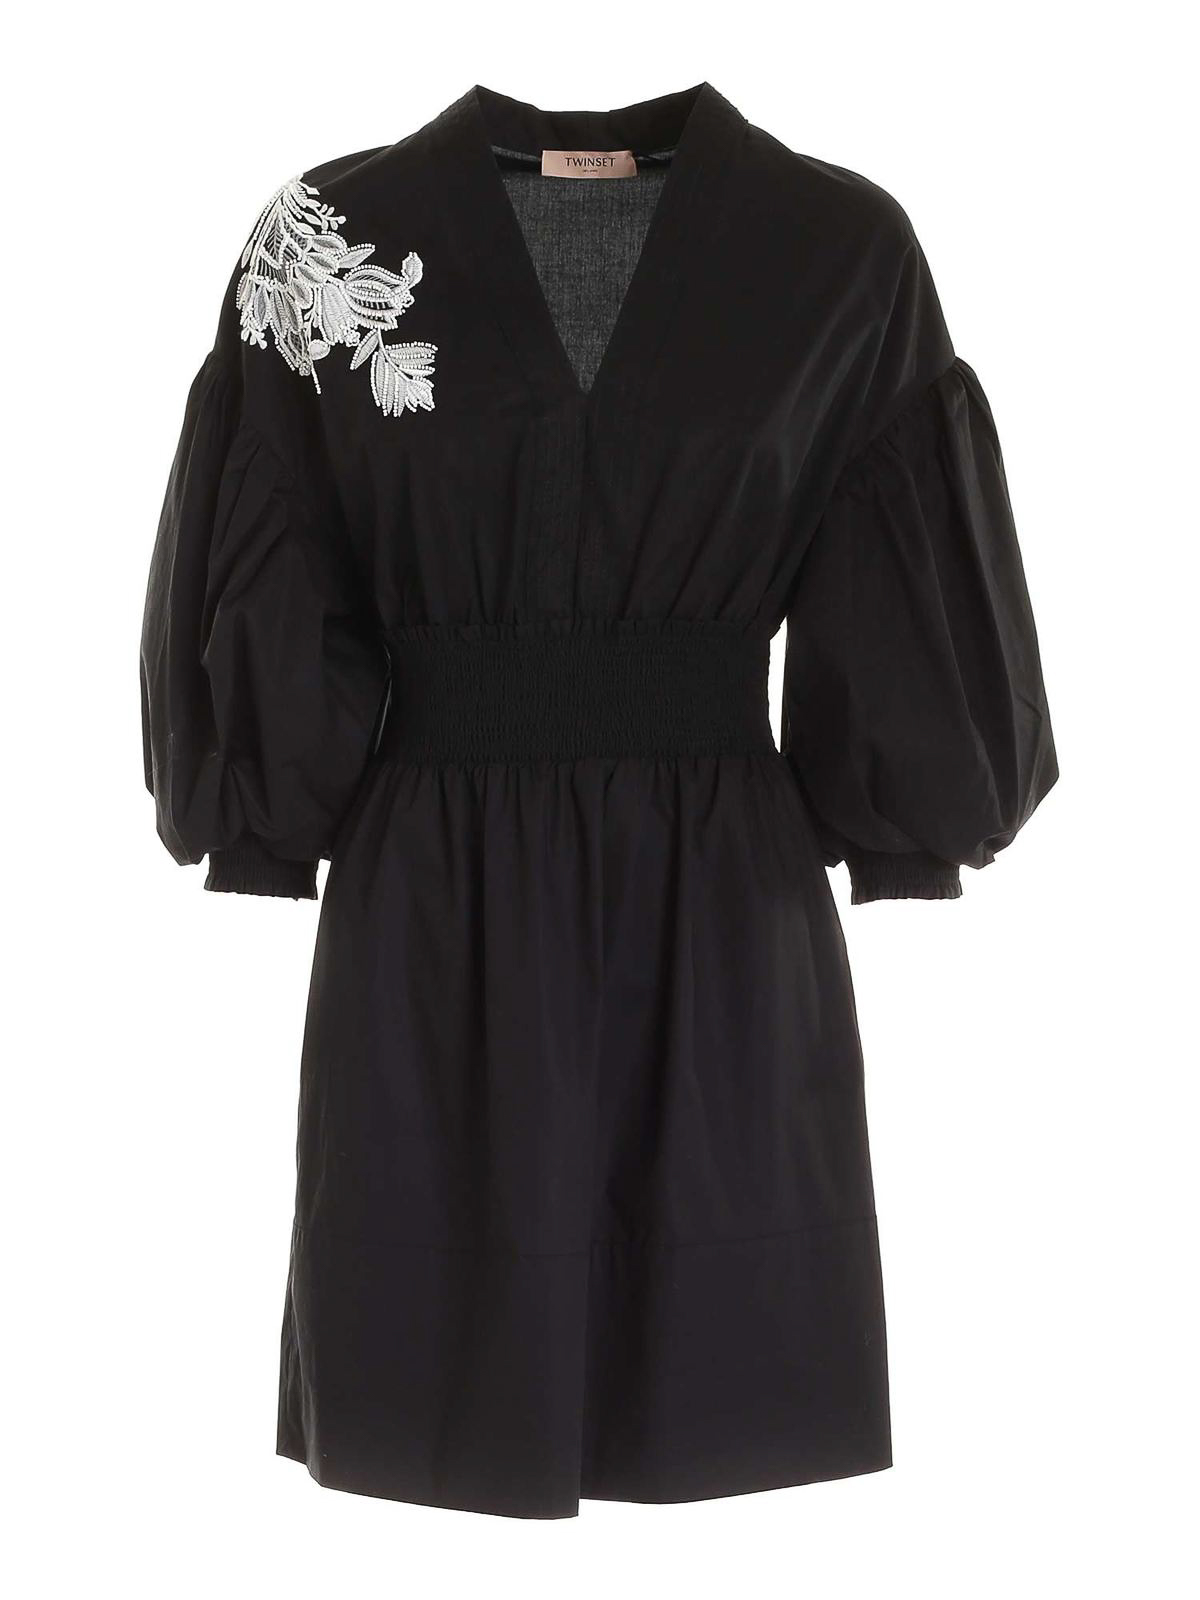 Twinset POPLIN KIMONO-STYLE DRESS